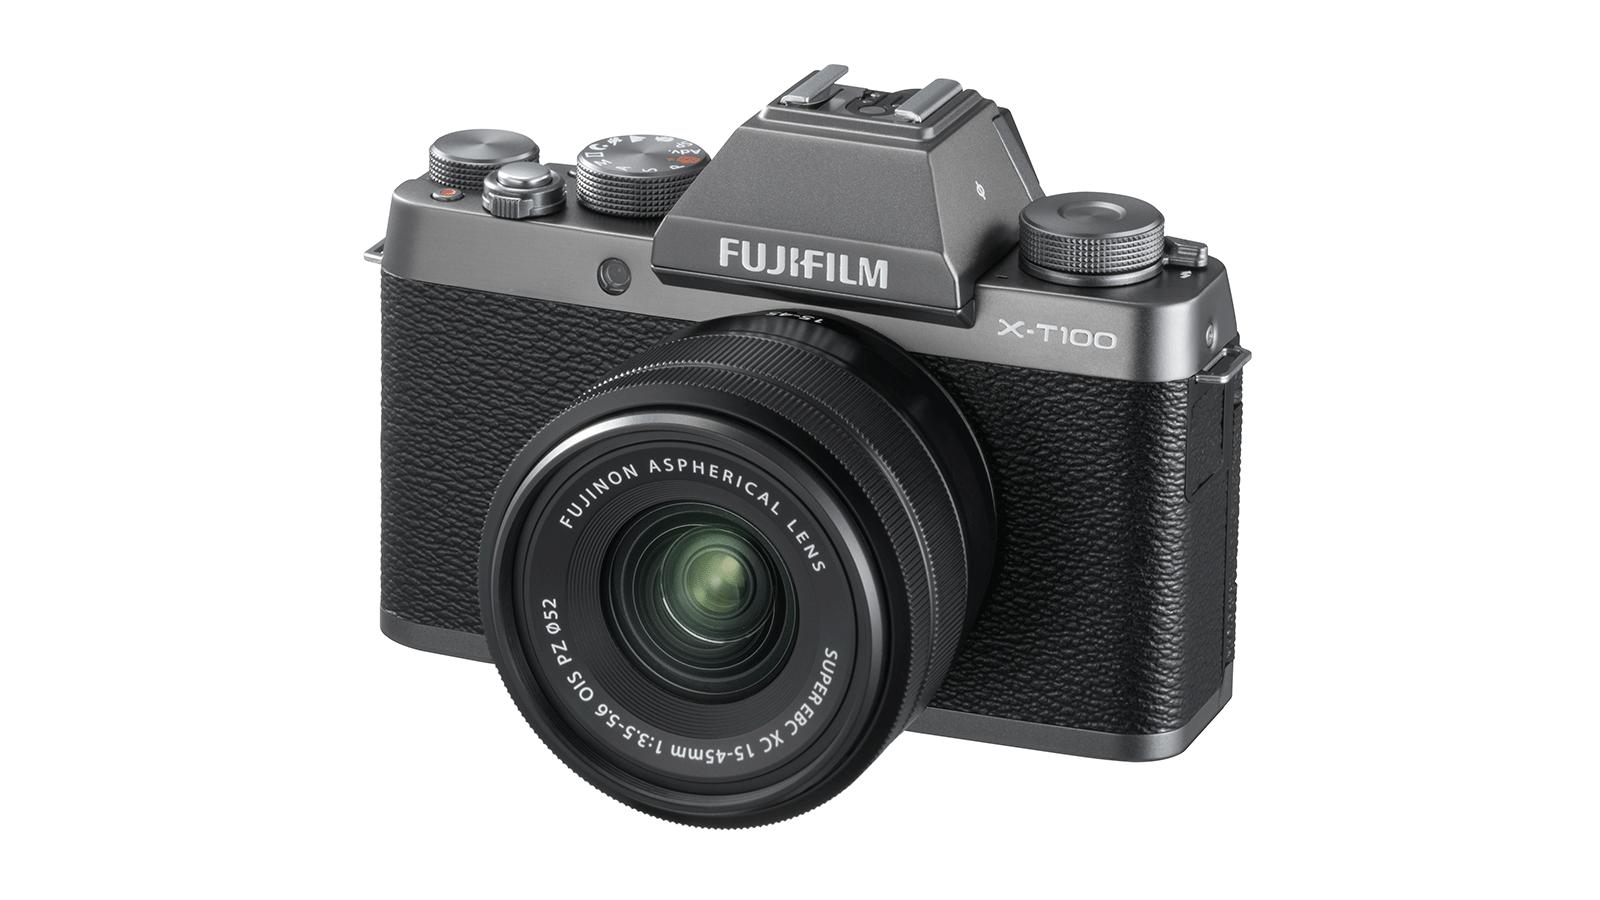 Fujifilm Introduces New Fujifilm X-T100